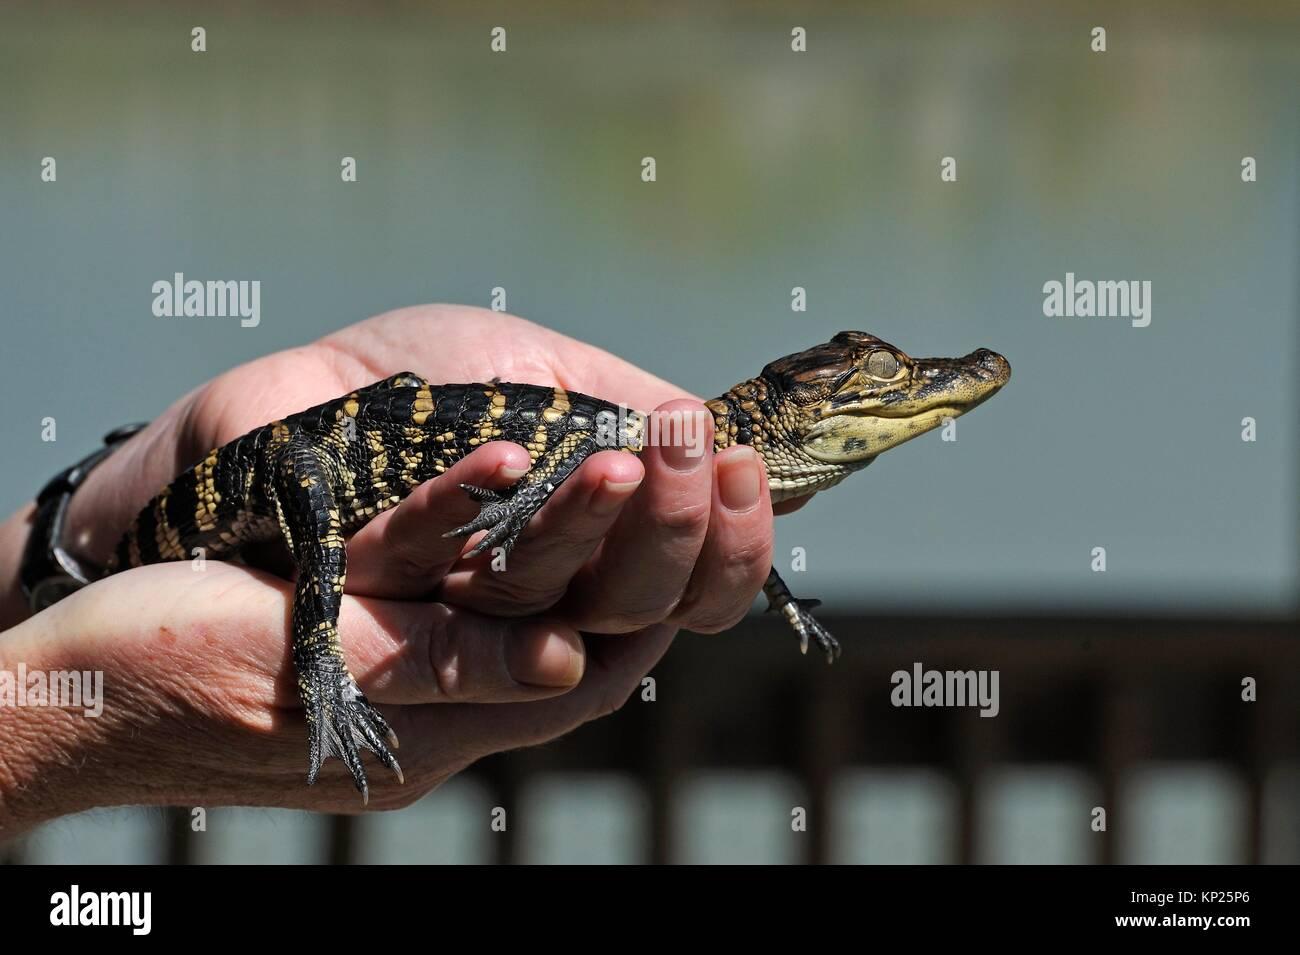 juvenile alligator, Gator Country Wildlife Adventure Park, Beaumont, Texas, United States of America, North America. - Stock Image